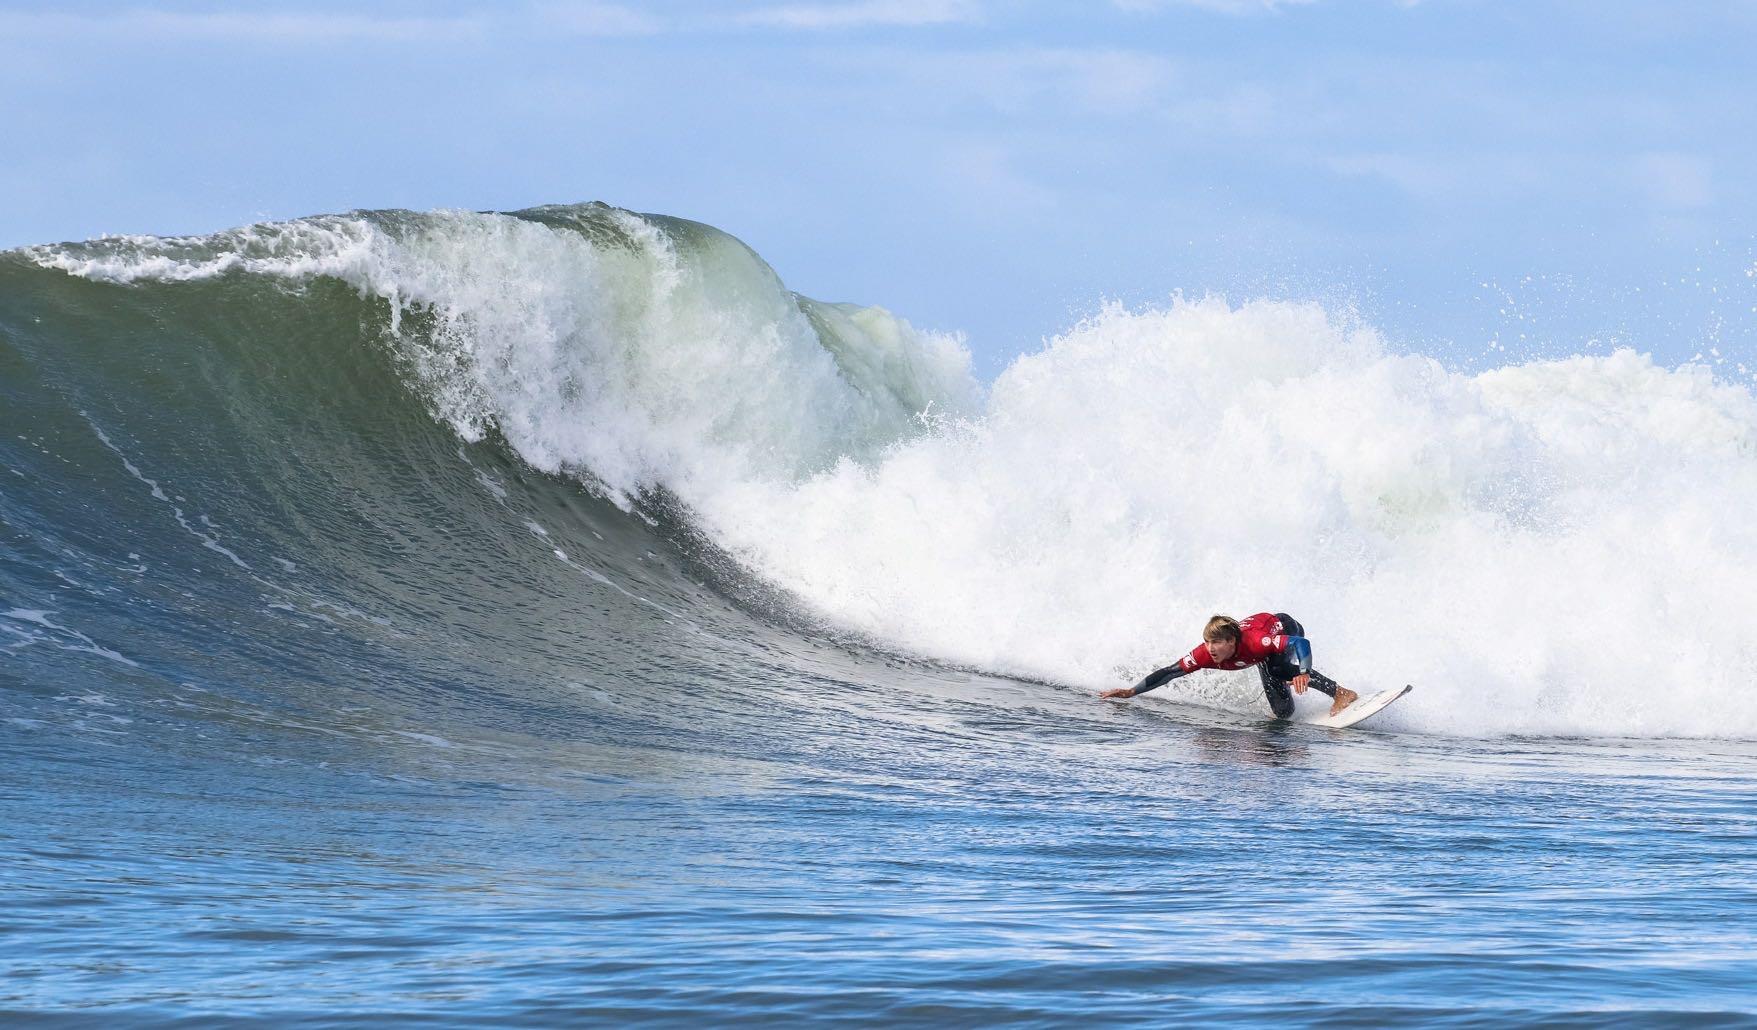 Matt McGillivray surfing in the Mitchum Buffalo City Surf Pro